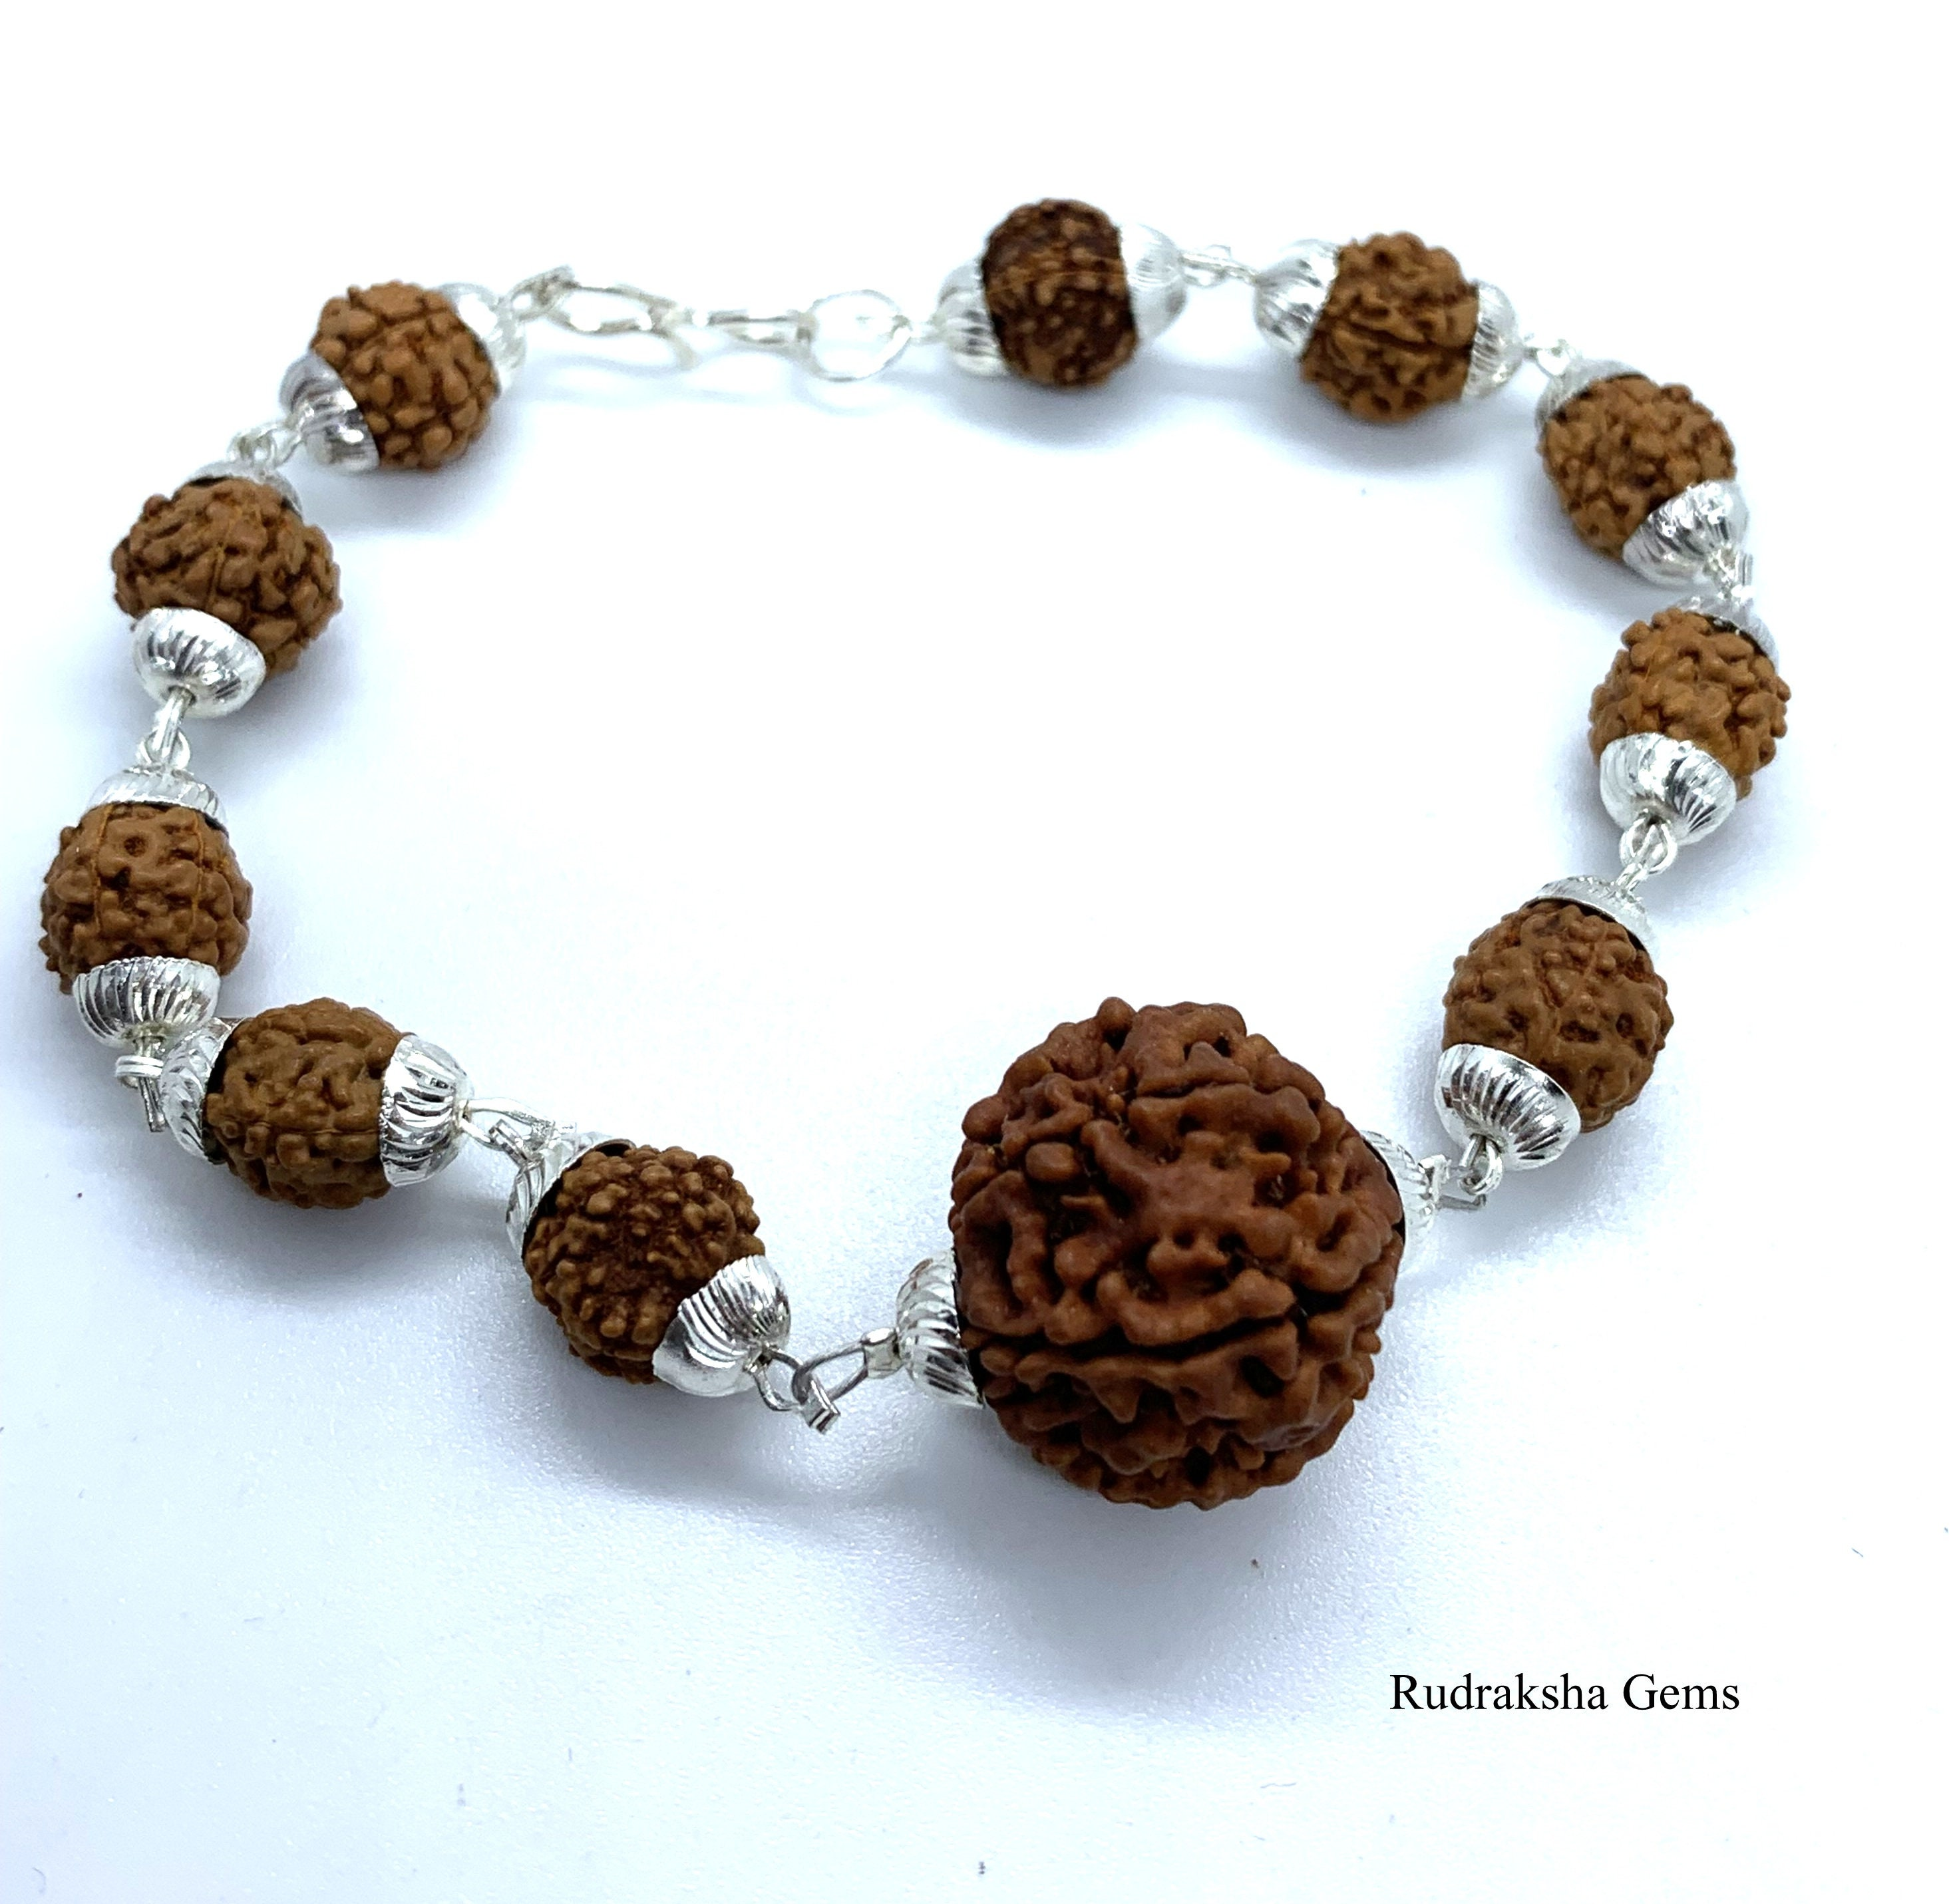 ba4f2eaed4a 7 mukhi Rudraksha Bracelet 7 face Rudraksha Bracelet Genuine | Etsy